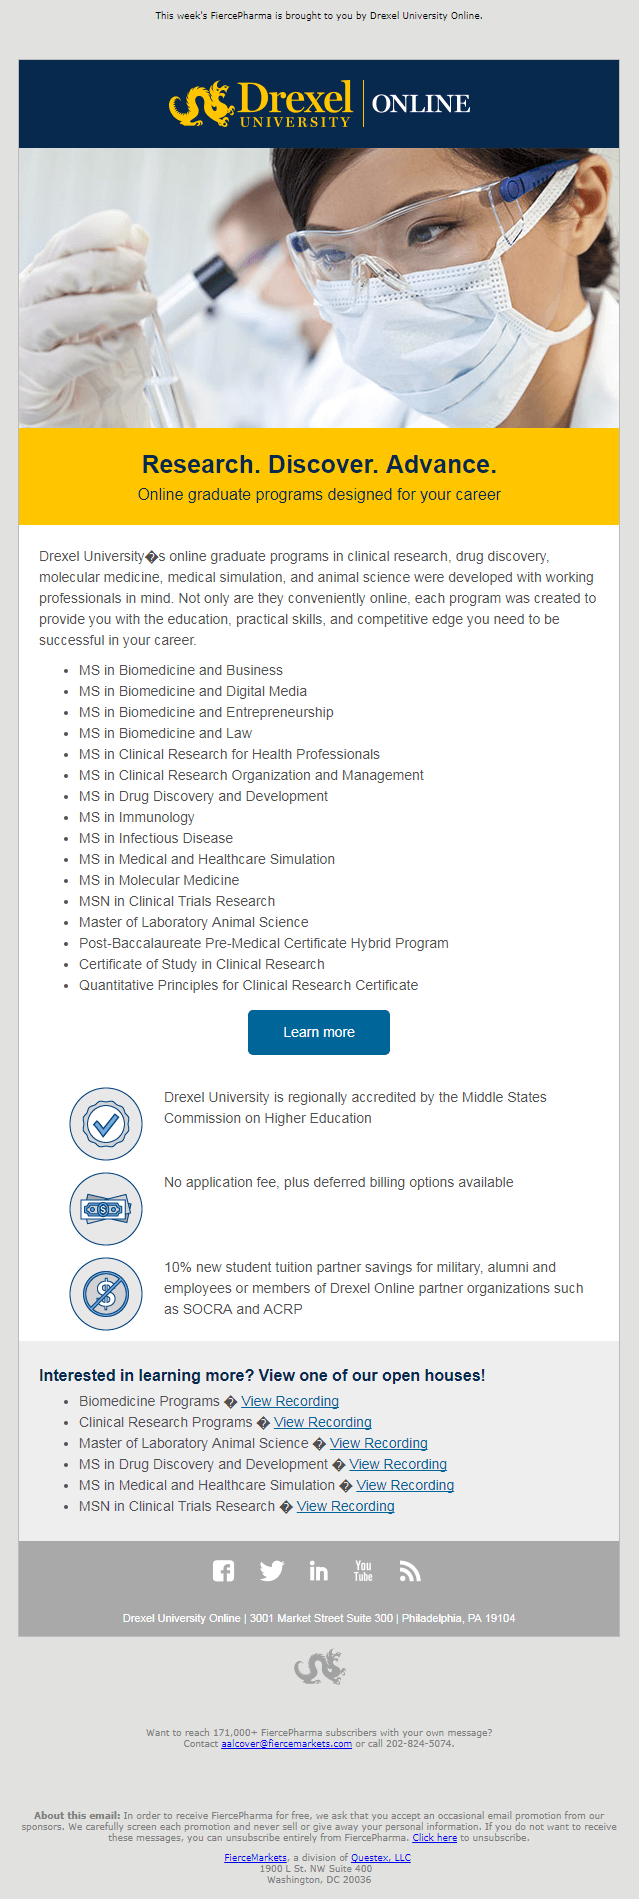 Drexel Educational Email